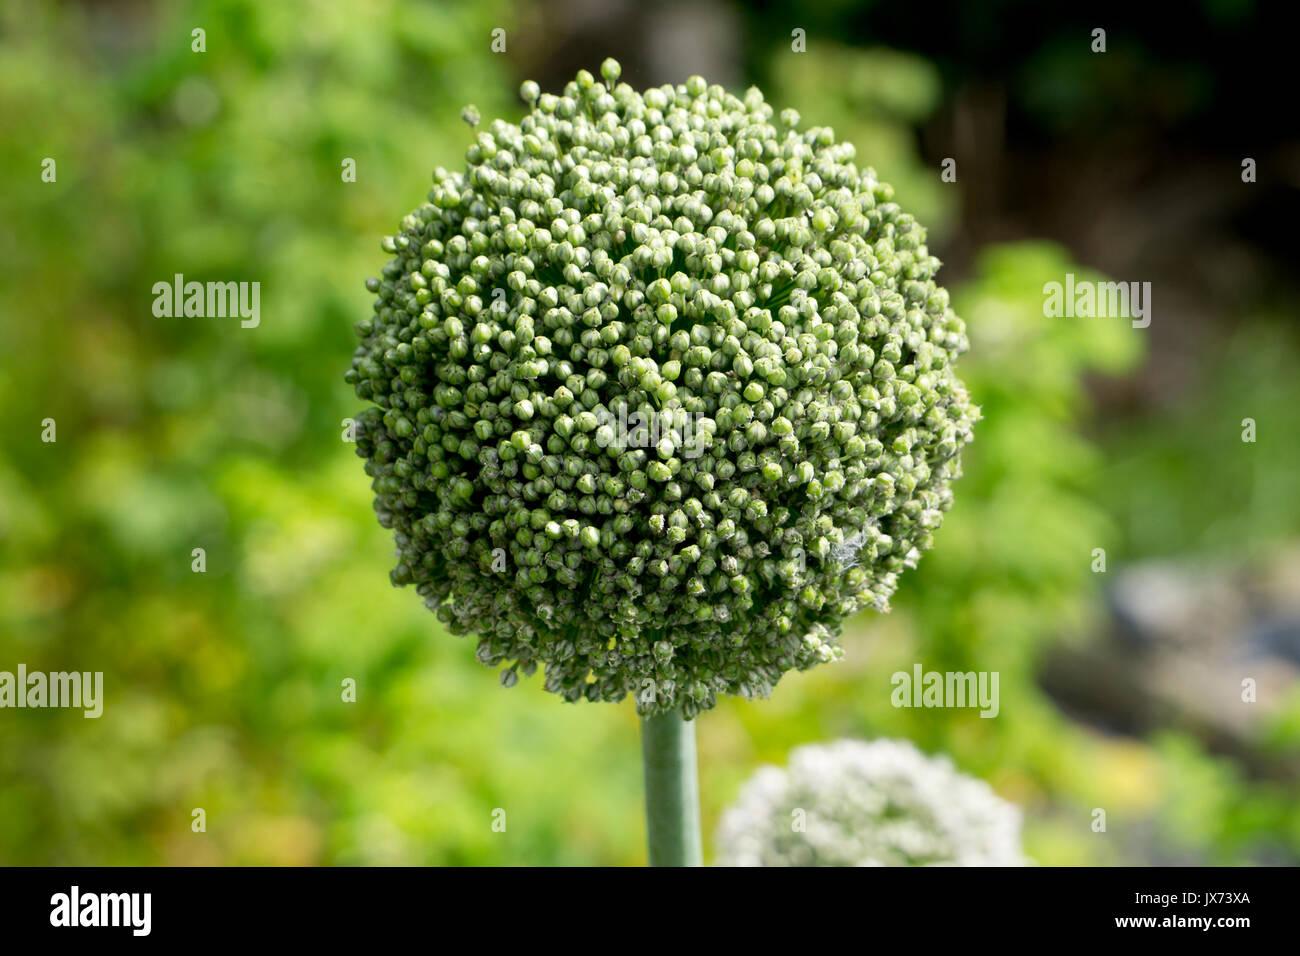 Zwiebel, Allium cepa Saatgut Stockbild